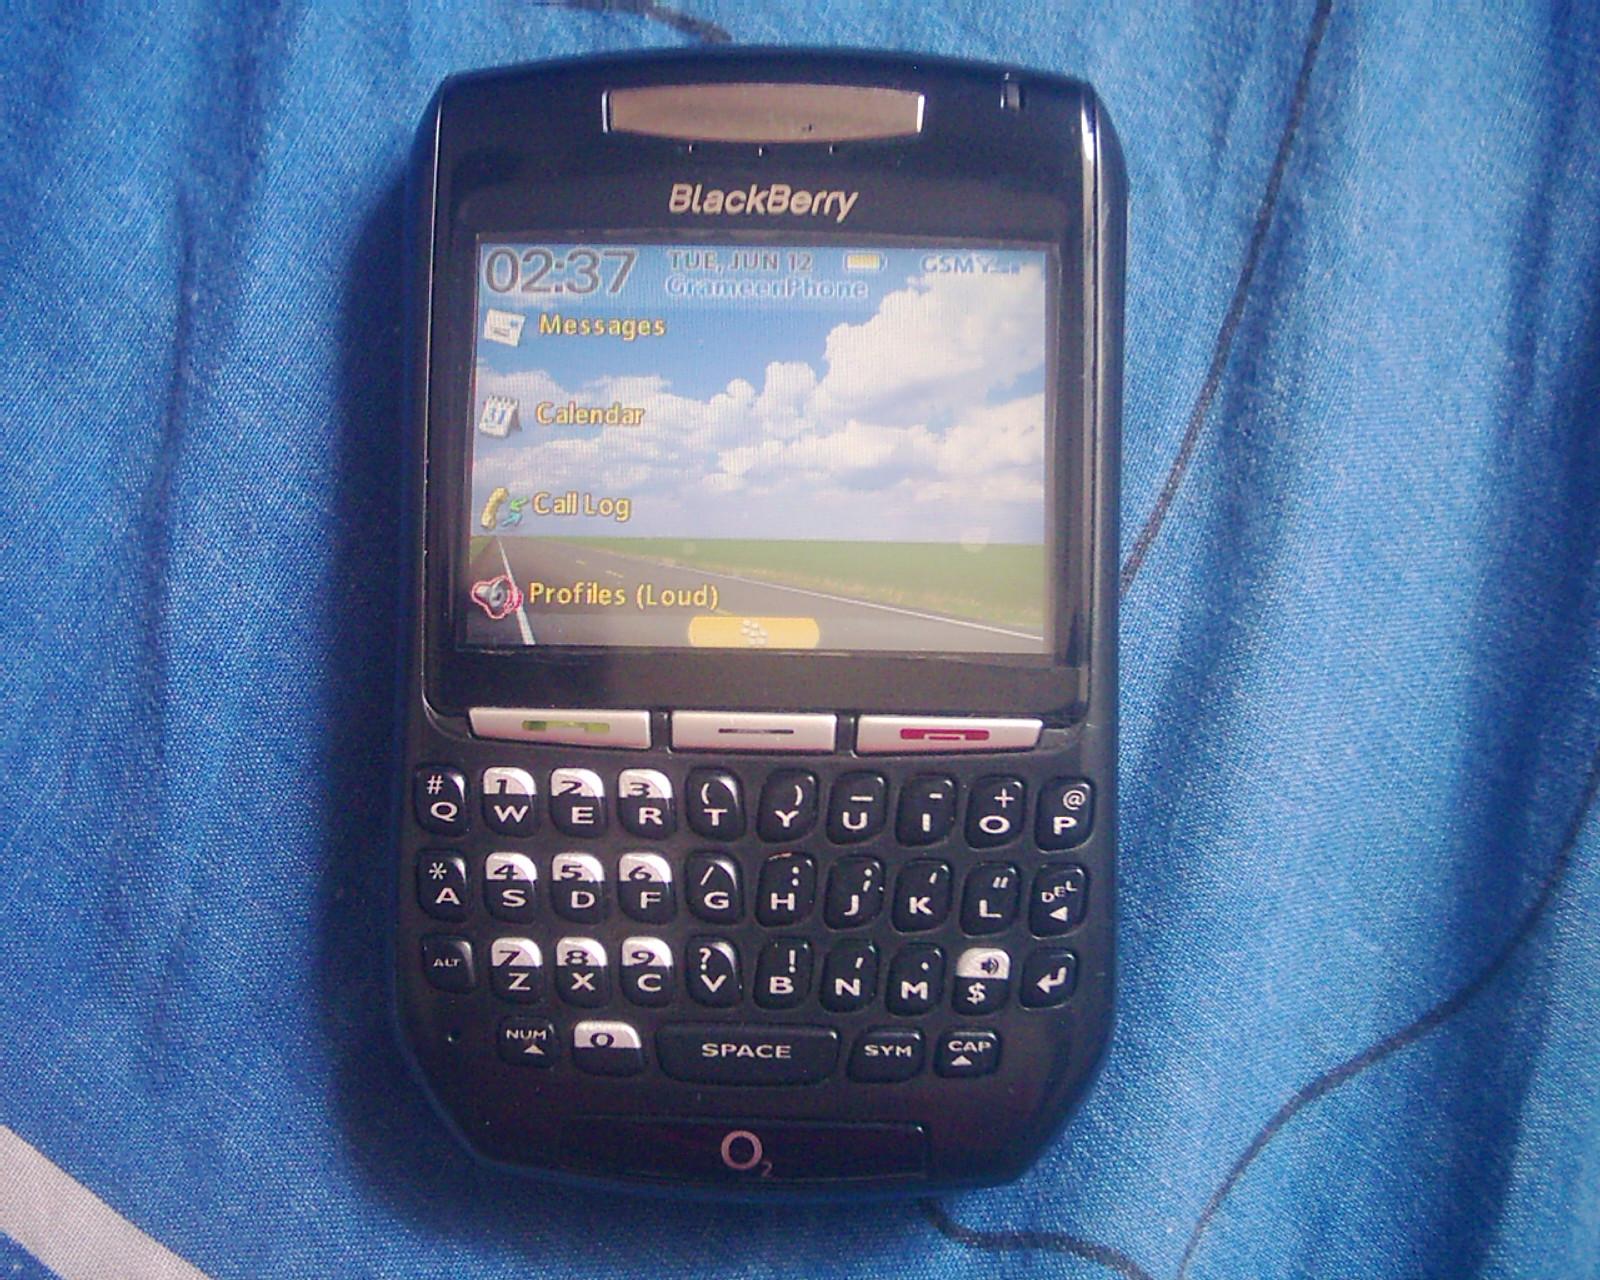 blackberry o brand new cond days money bak guarantee clickbd blackberry 8707 o2 brand new cond 3days money bak guarantee large image 0